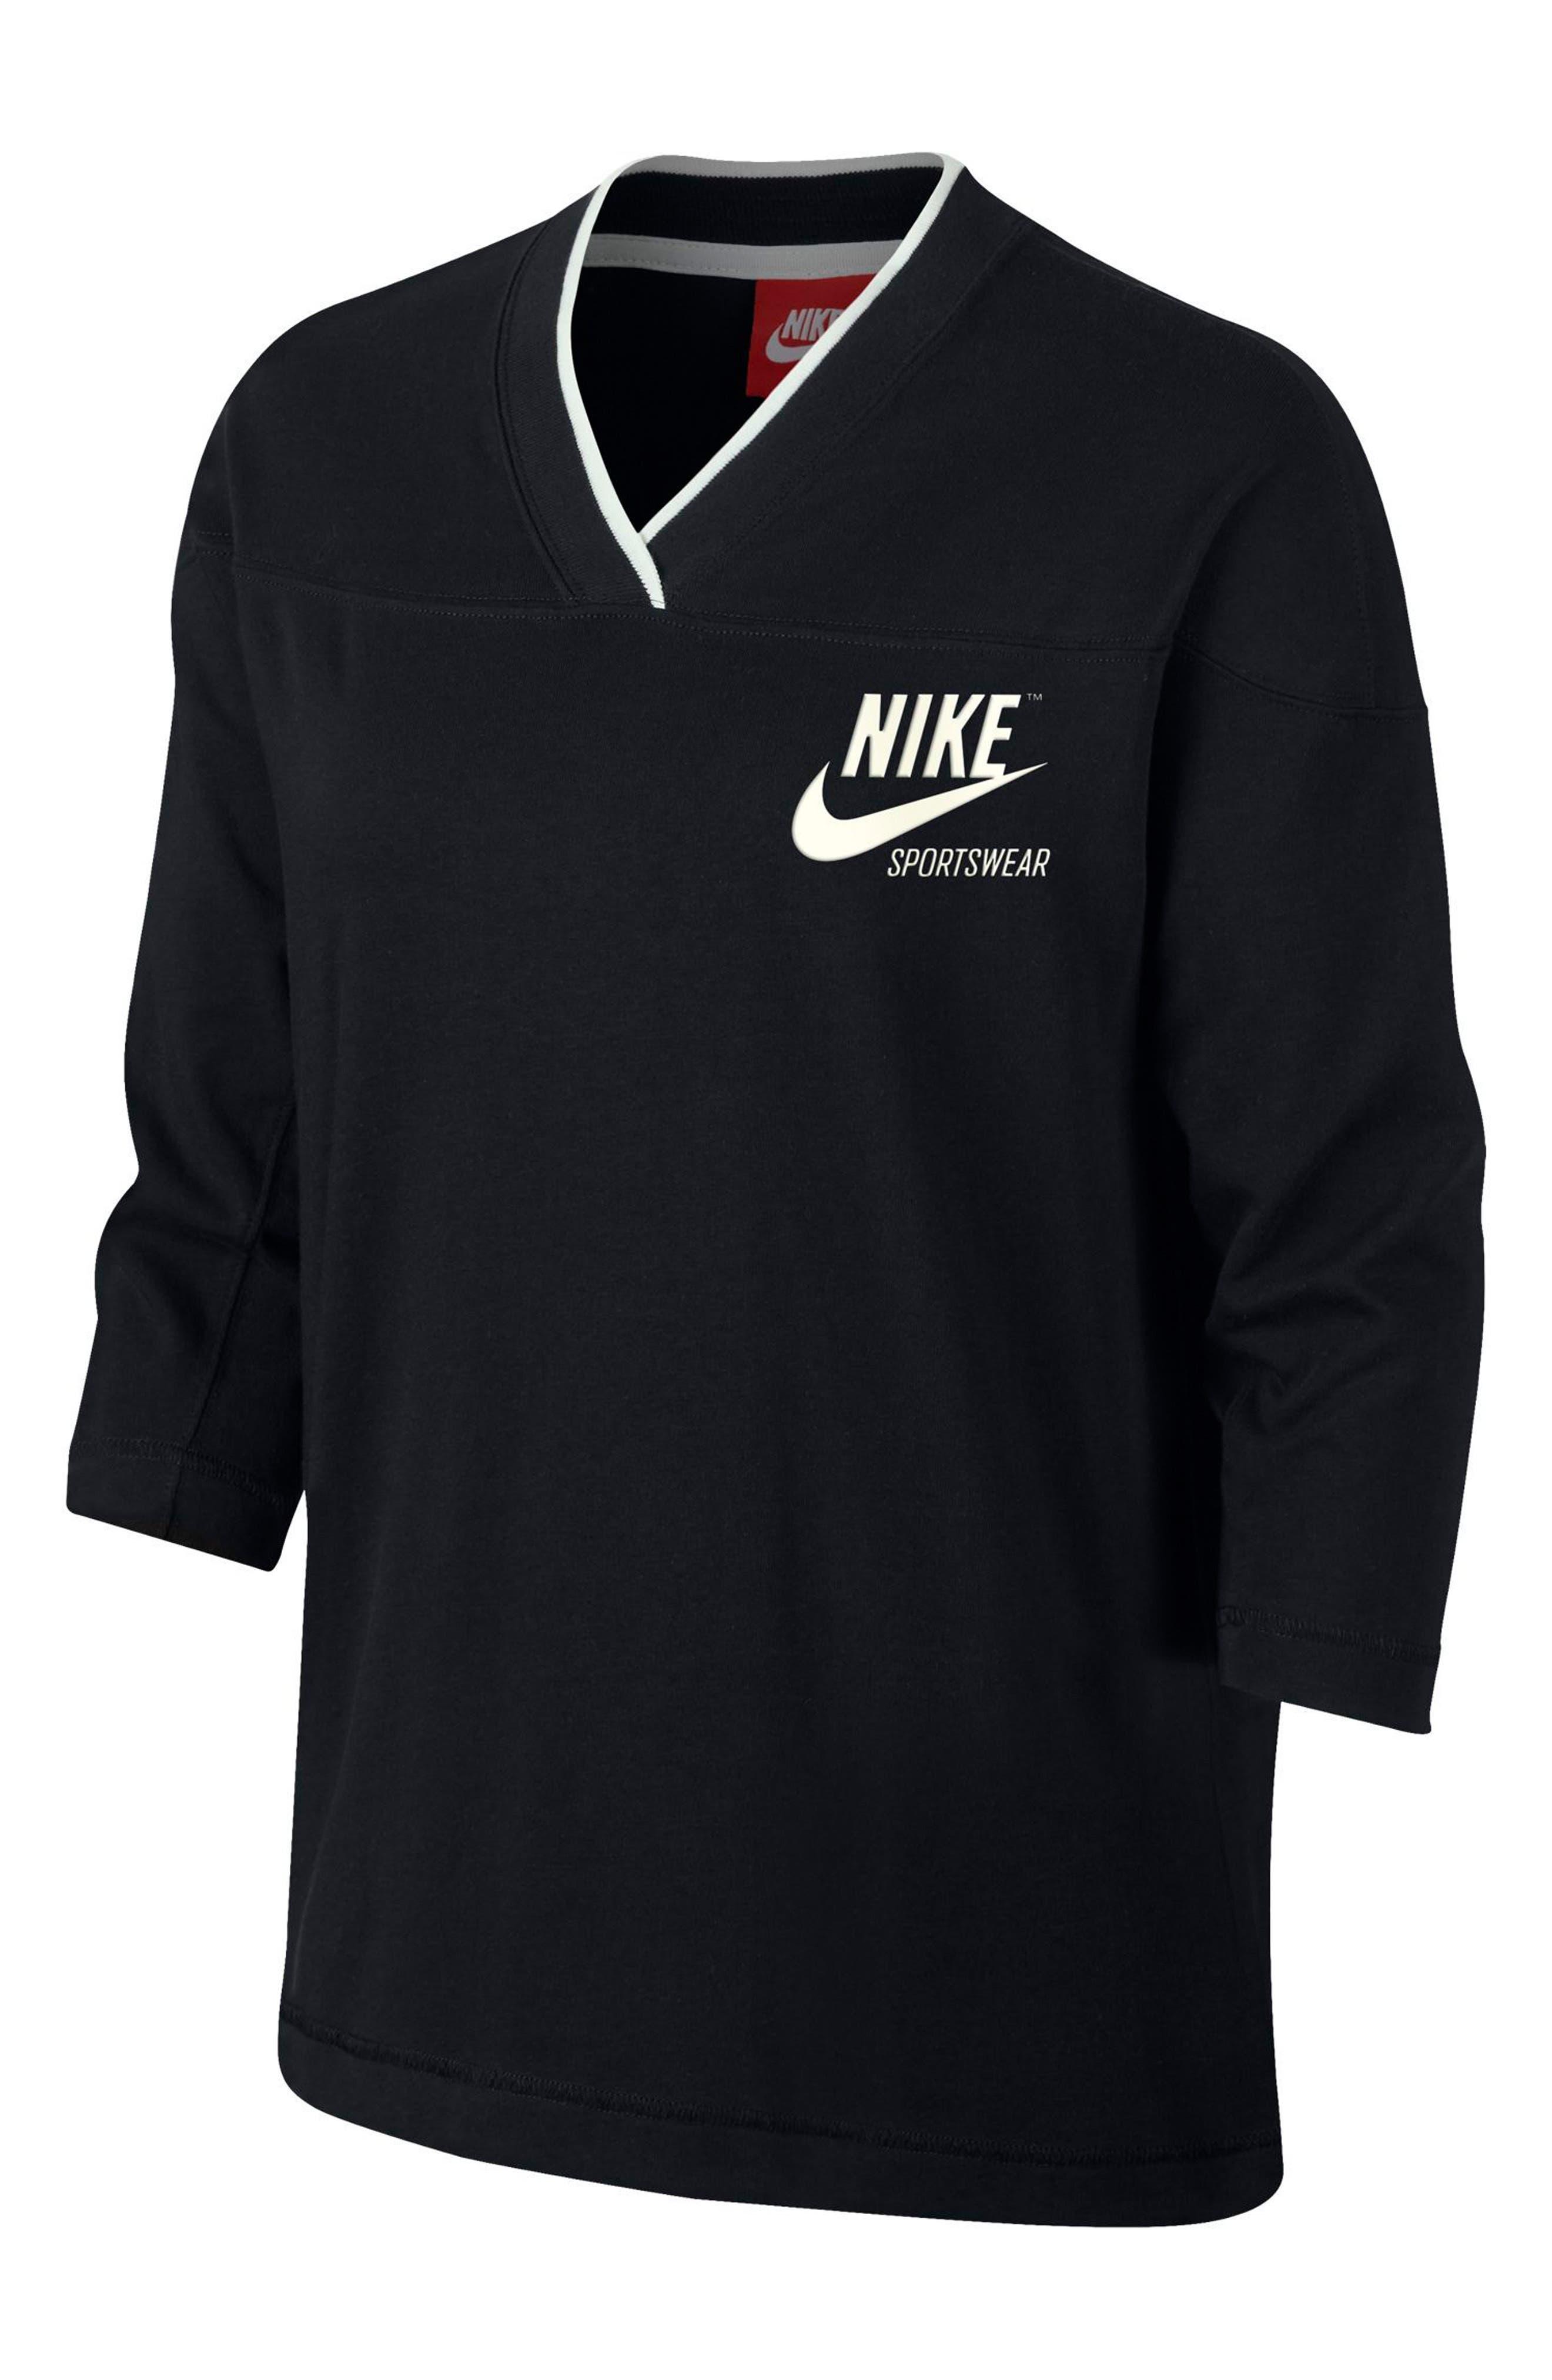 Sportswear Women's V-Neck Top,                             Main thumbnail 1, color,                             Black/ Sail